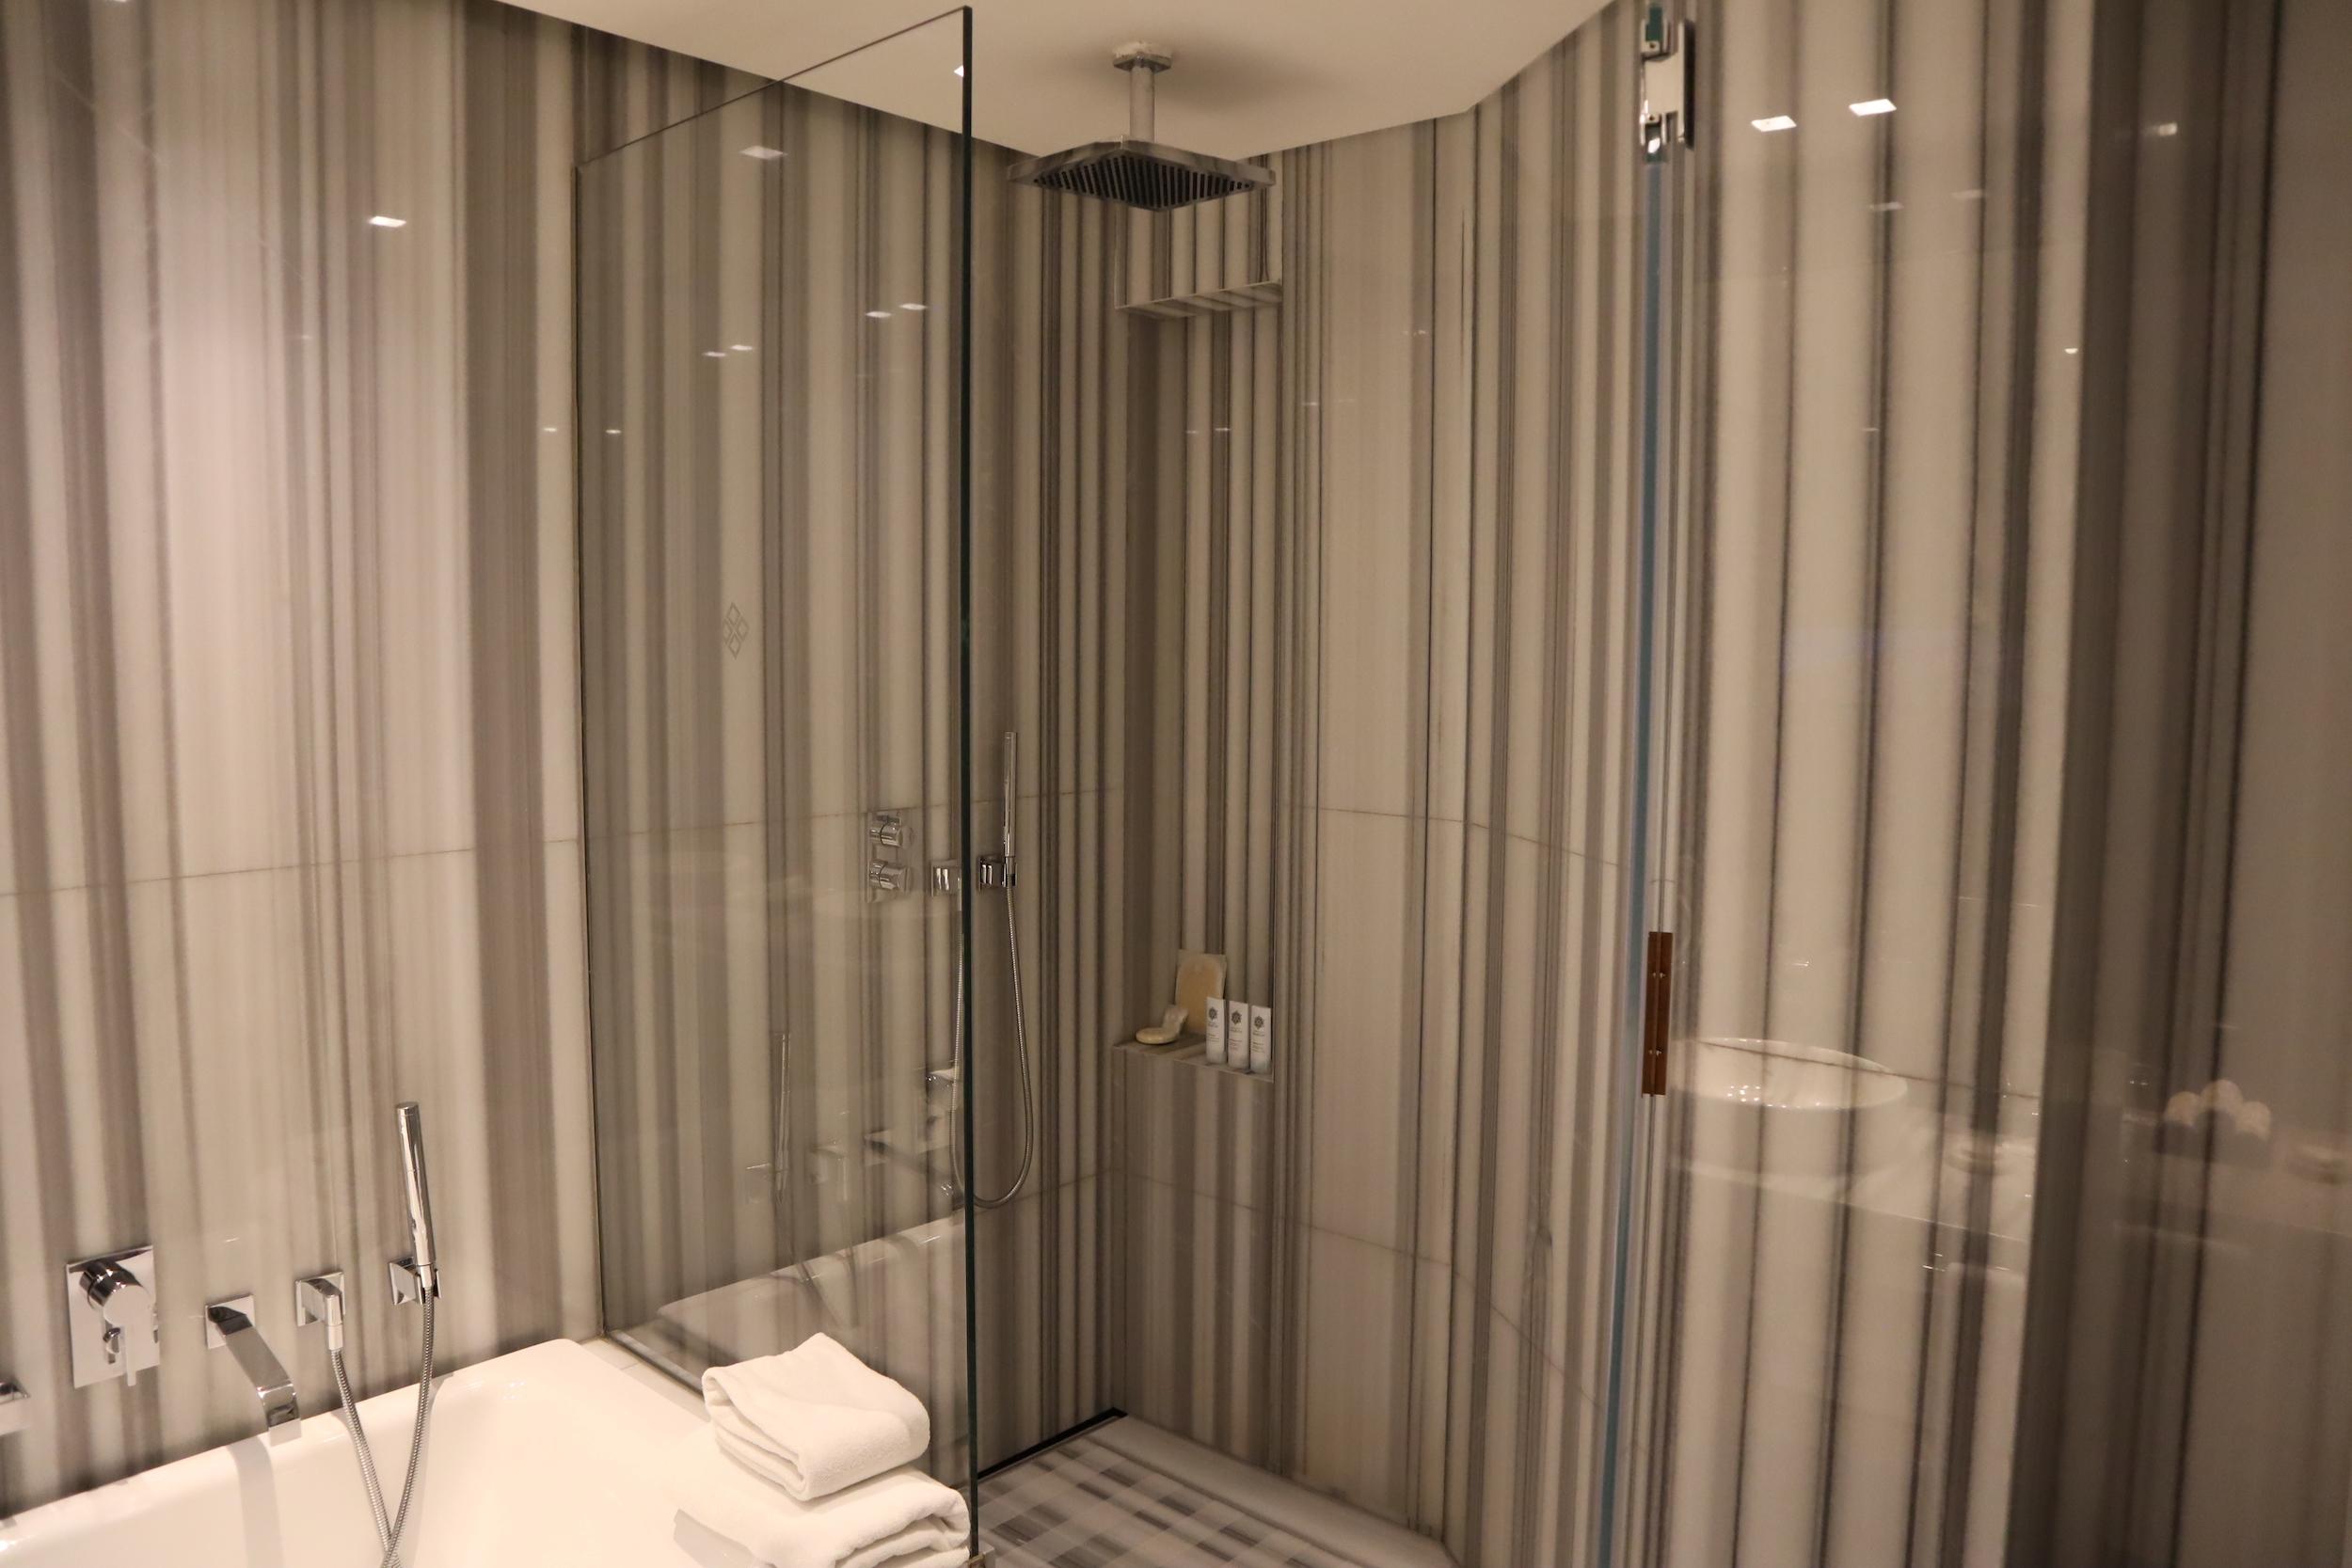 St. Regis Istanbul – St. Regis Suite shower